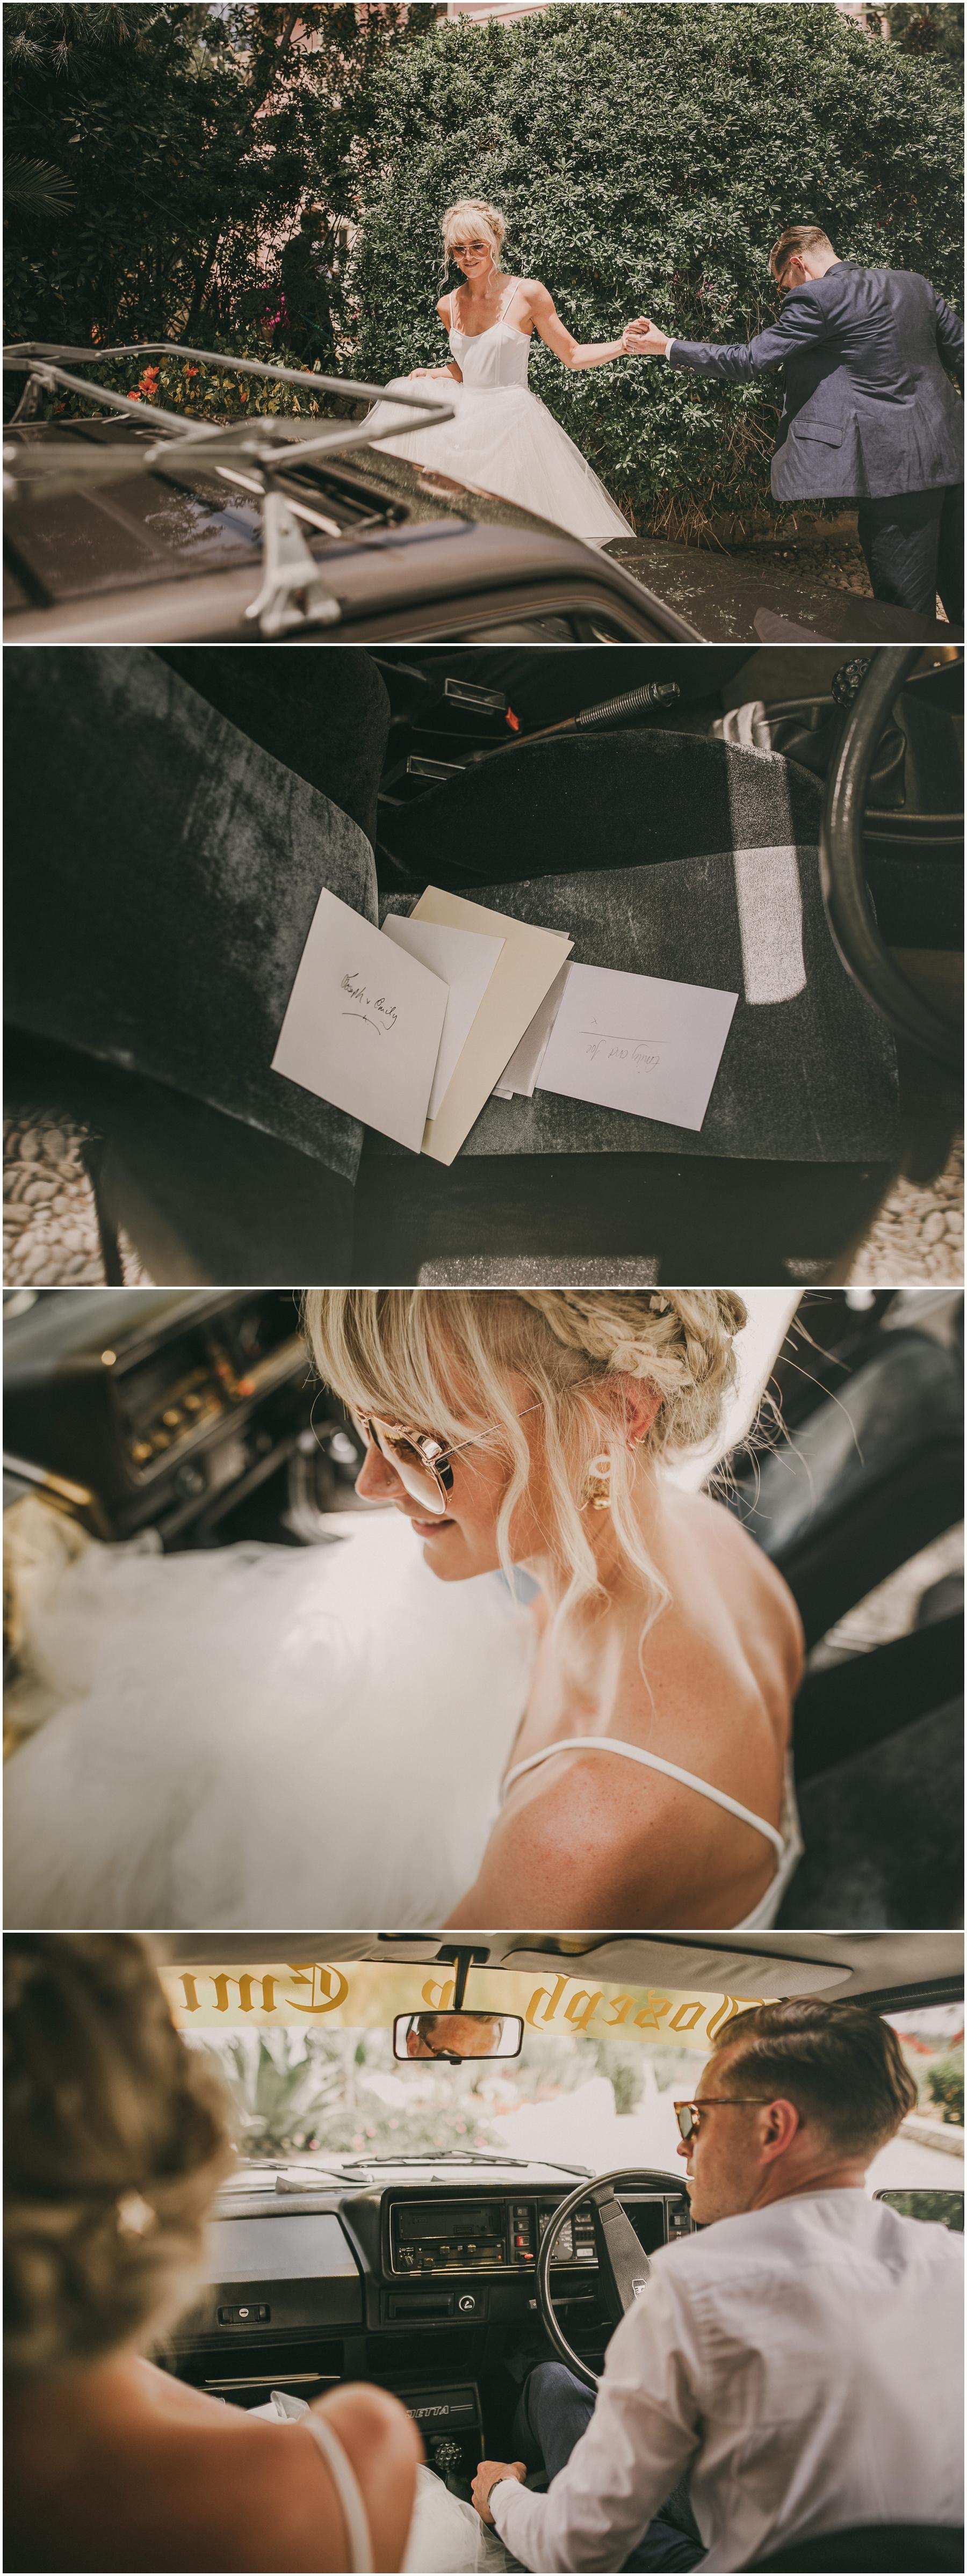 Emily & Joseph London wedding  by Pablo Laguia 111.JPG